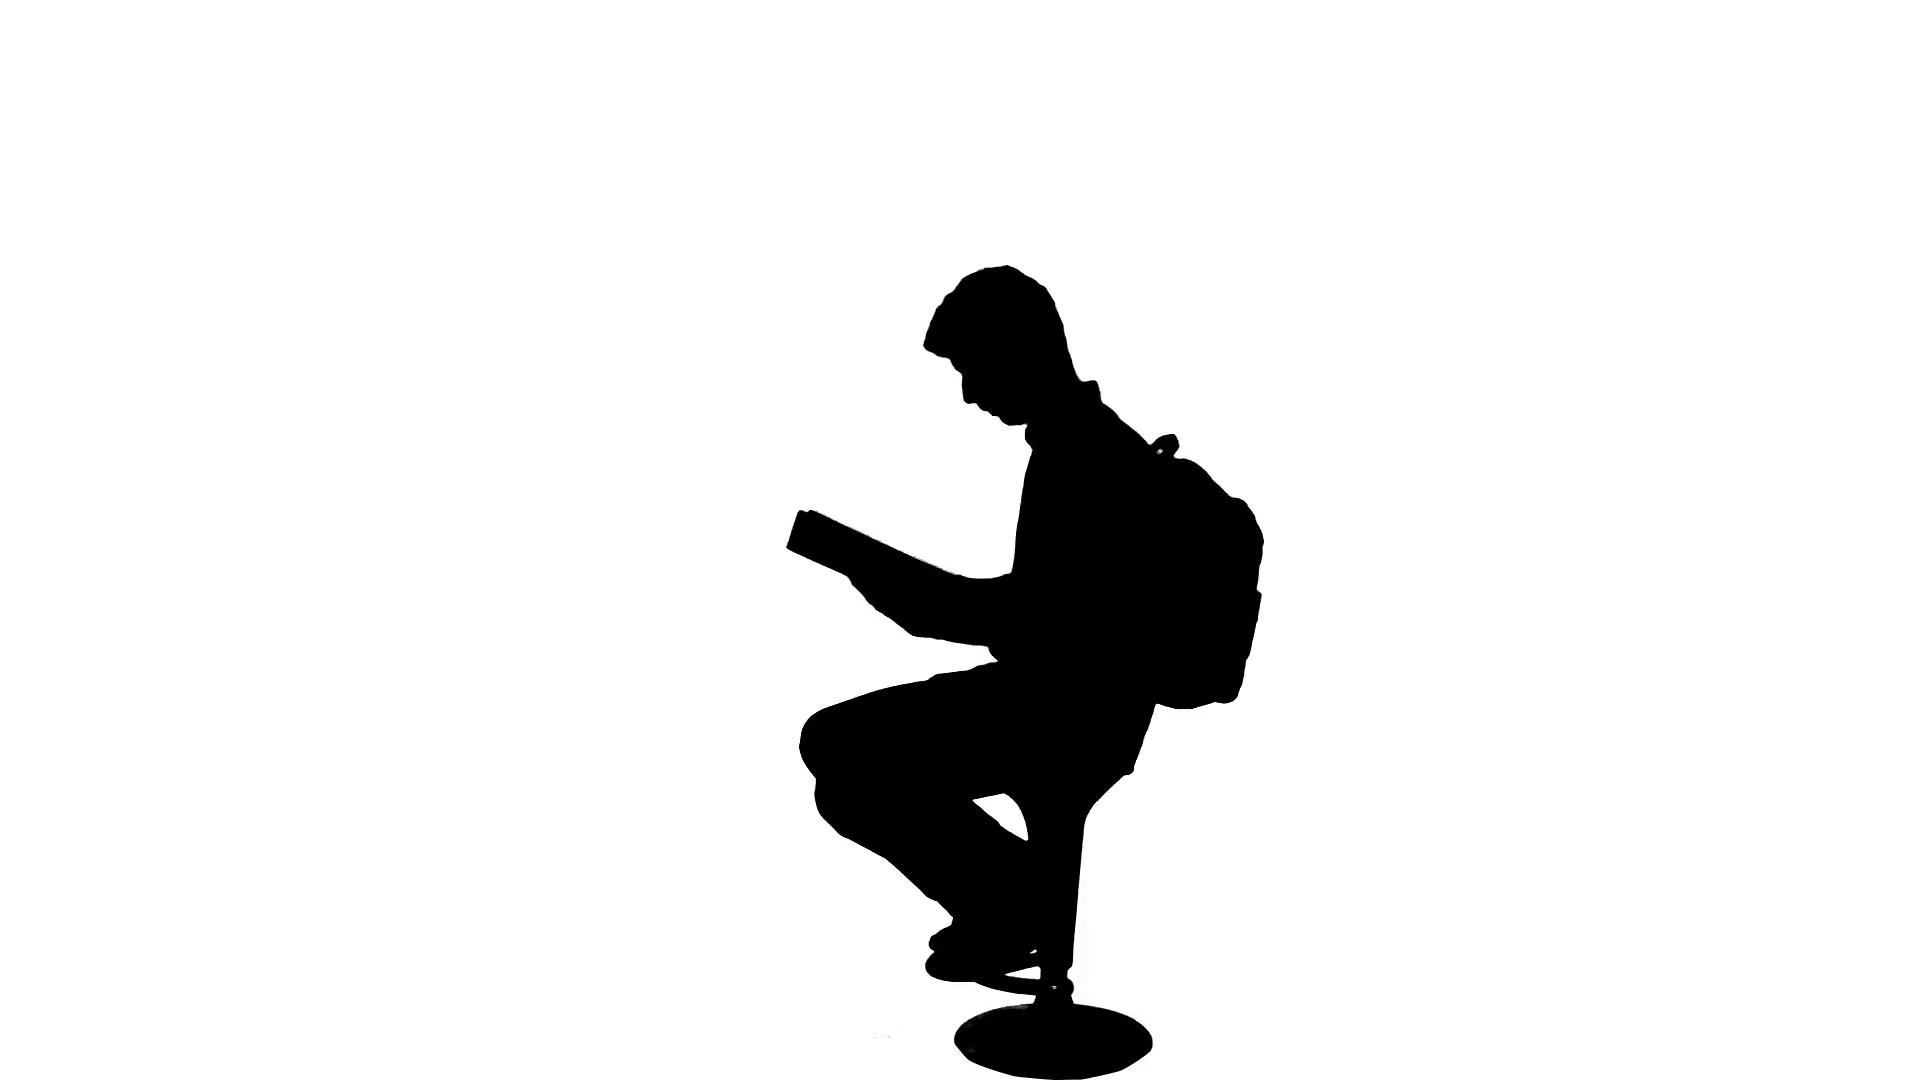 1920x1080 University Student Exams Reading Book Silhouette